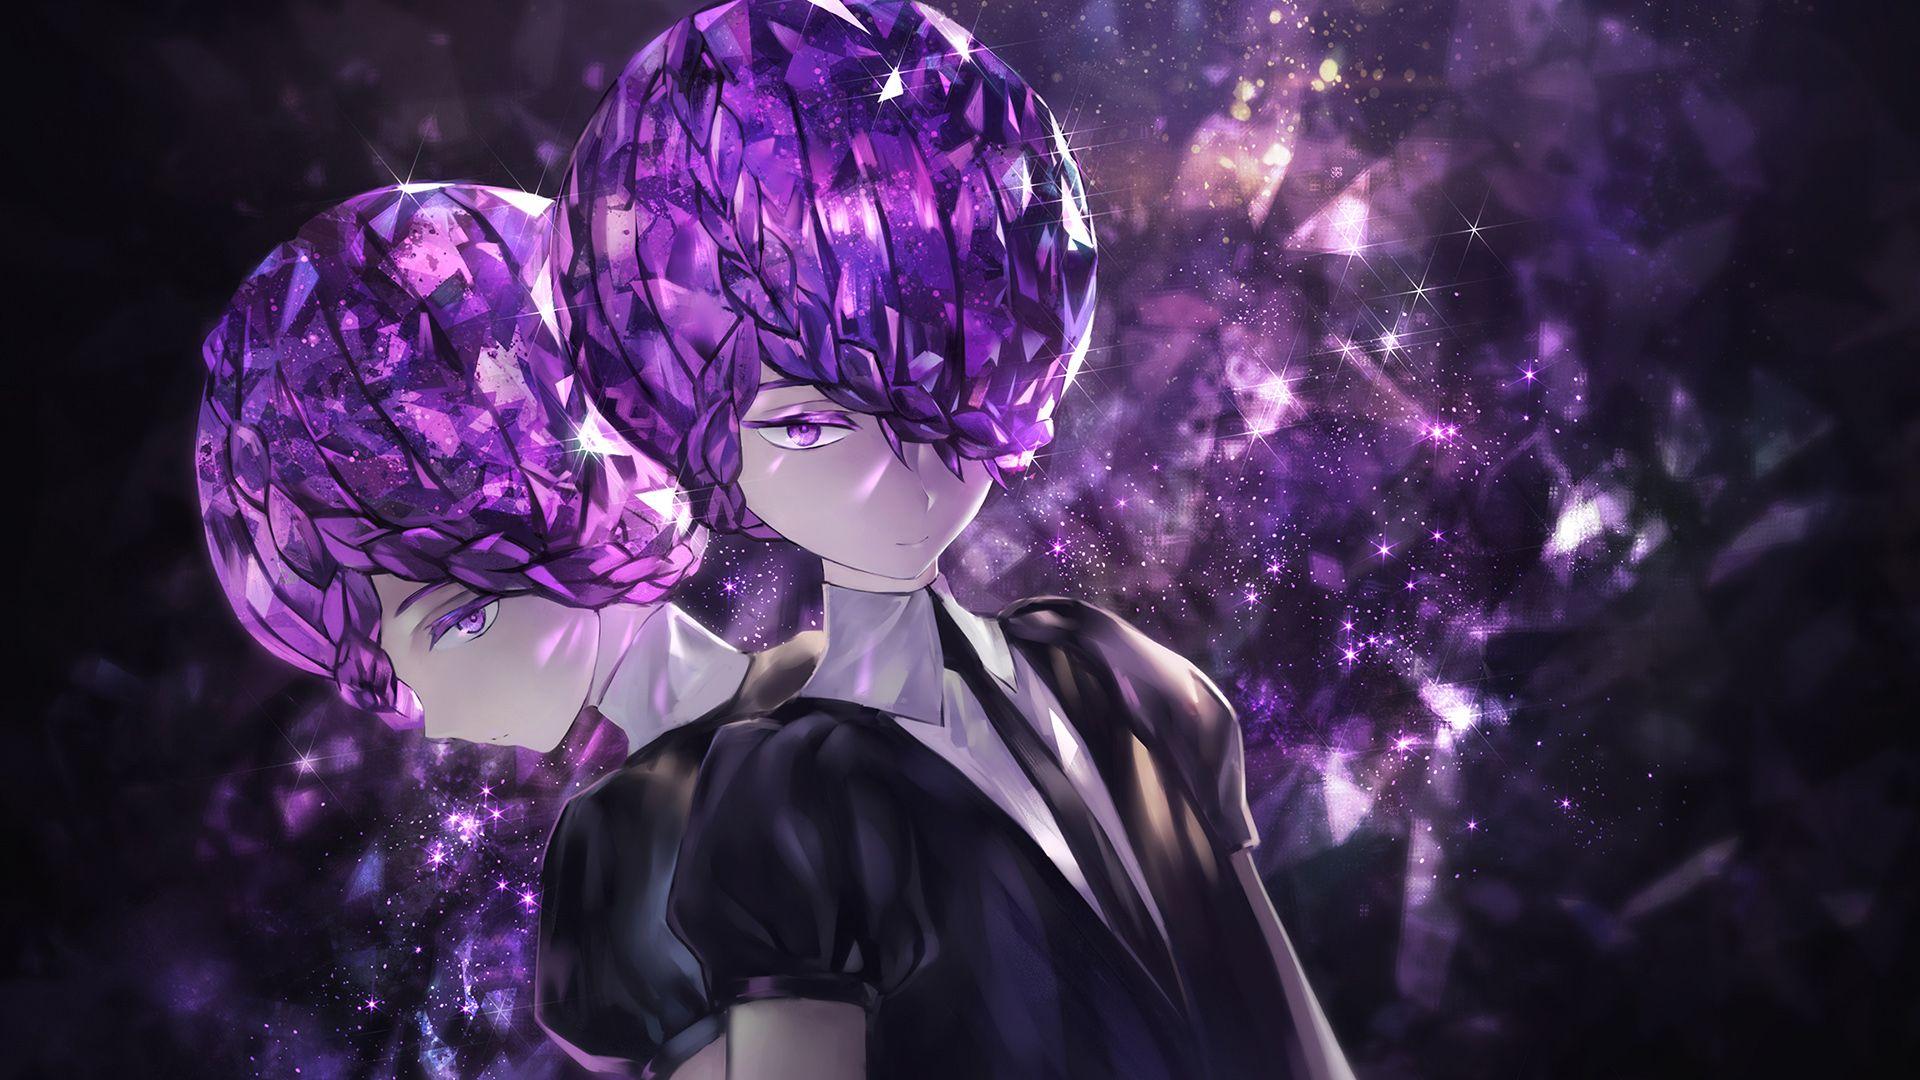 Amethysts Anime Wallpaper Anime Land